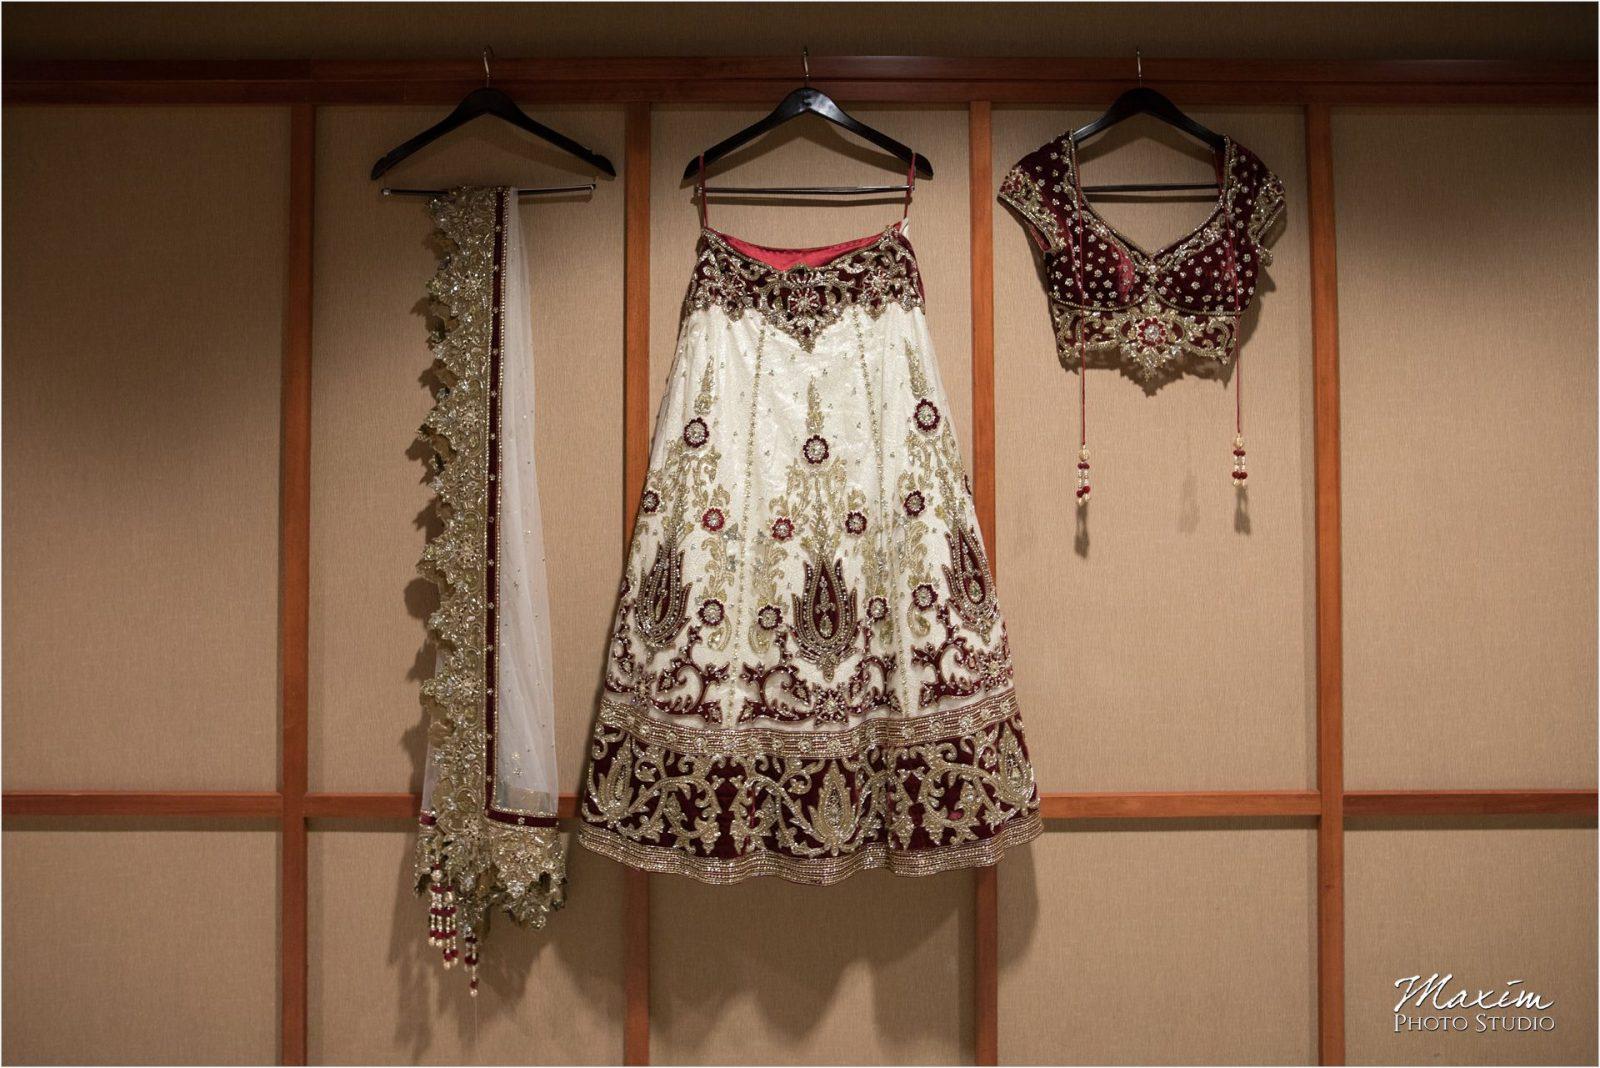 Savannah Center Indian Wedding Bridal Lehenga Choli with Dupatta